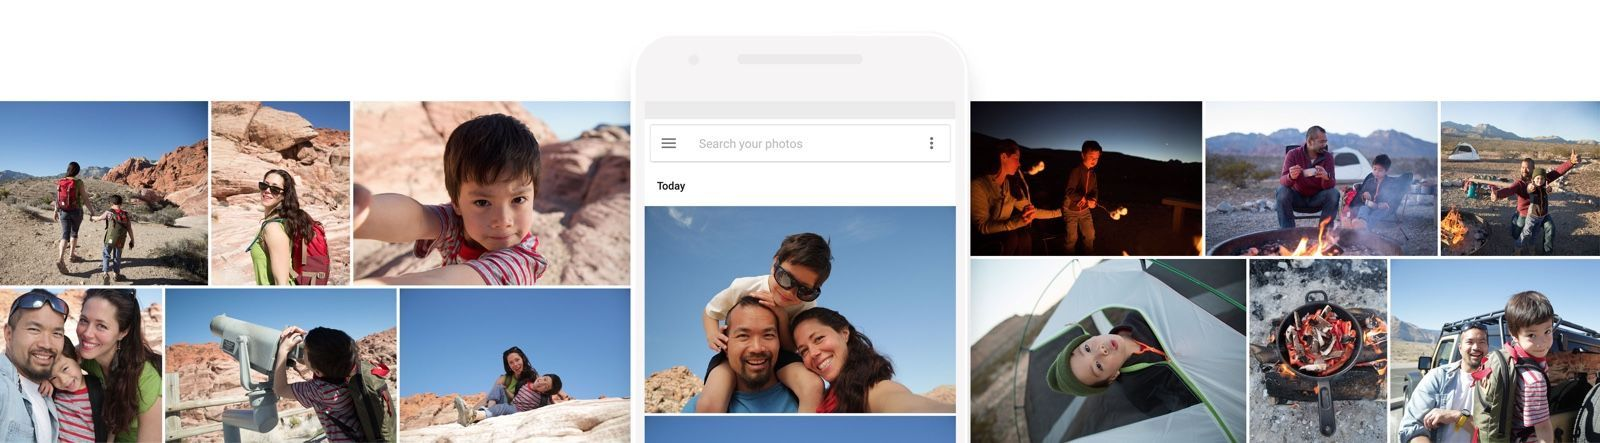 trucos para google fotos